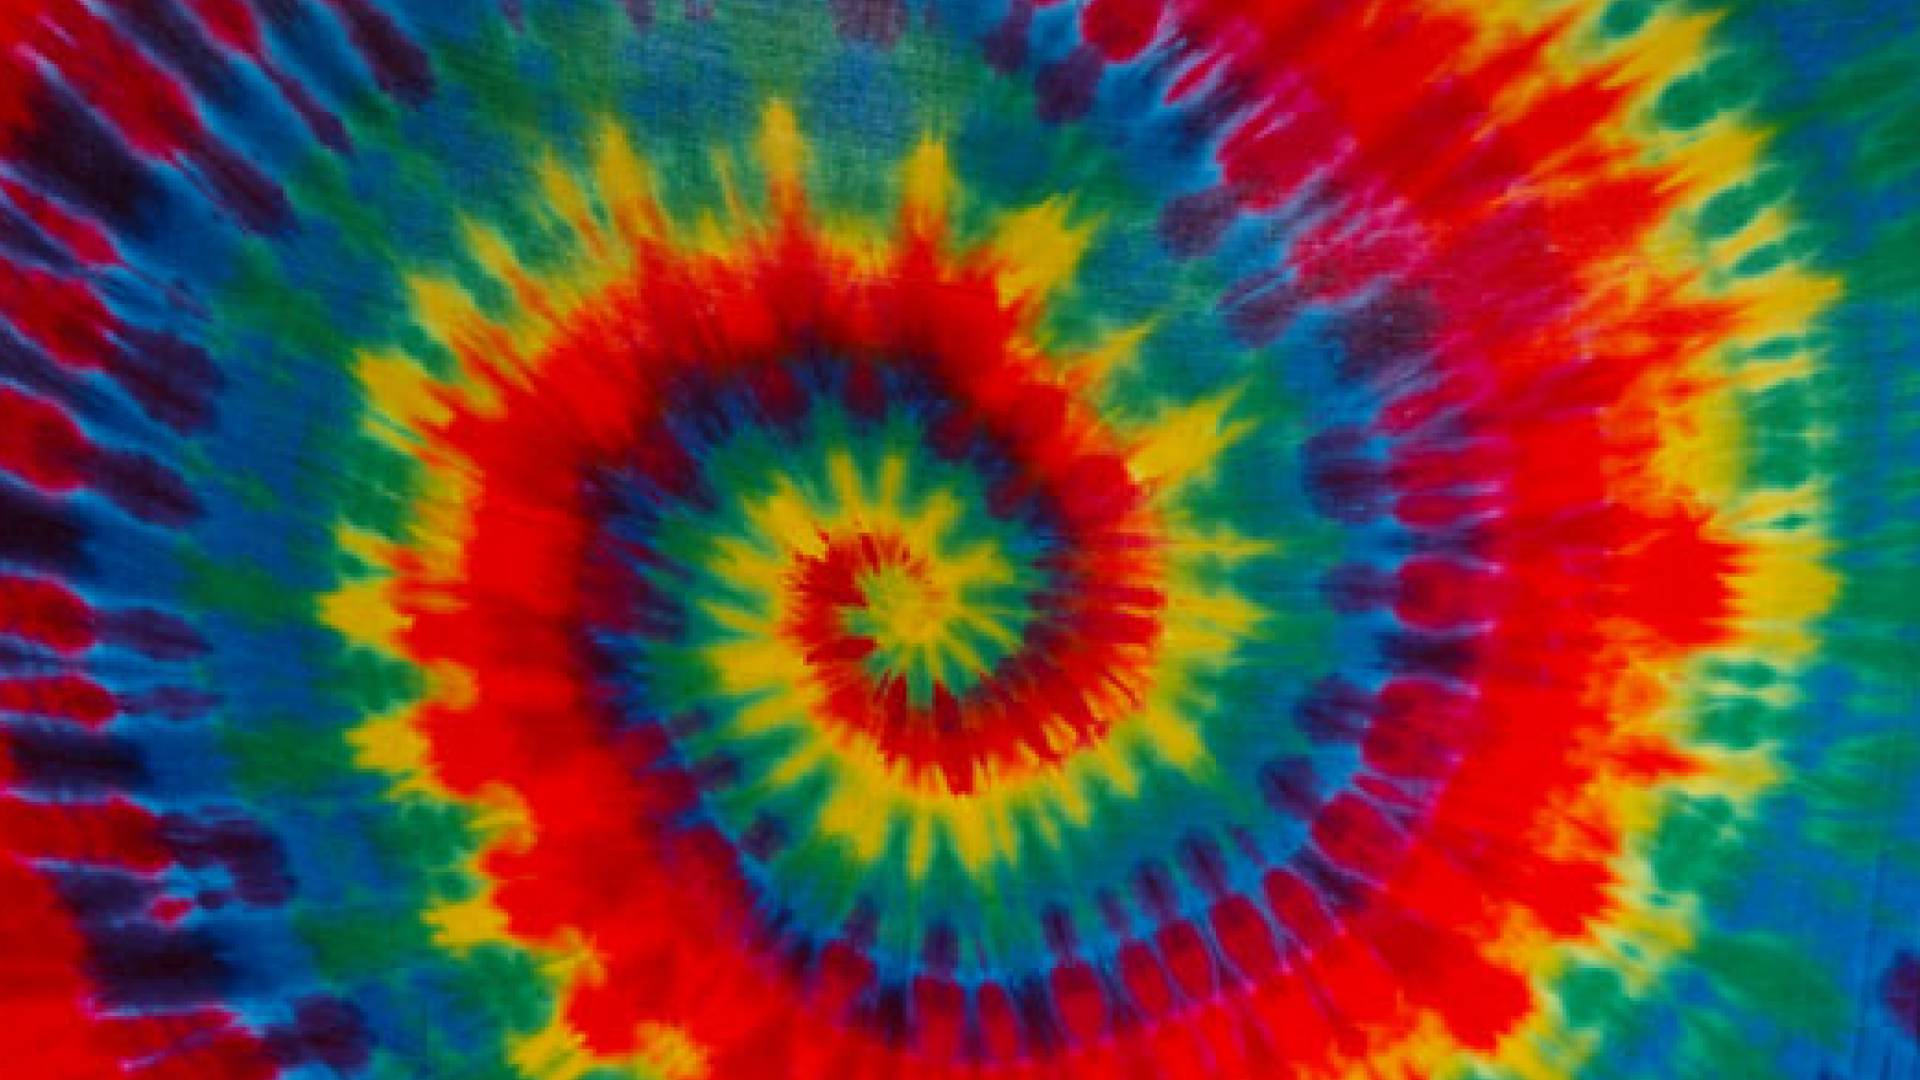 Tie Dye Wallpaper High Resolution 1920x1080